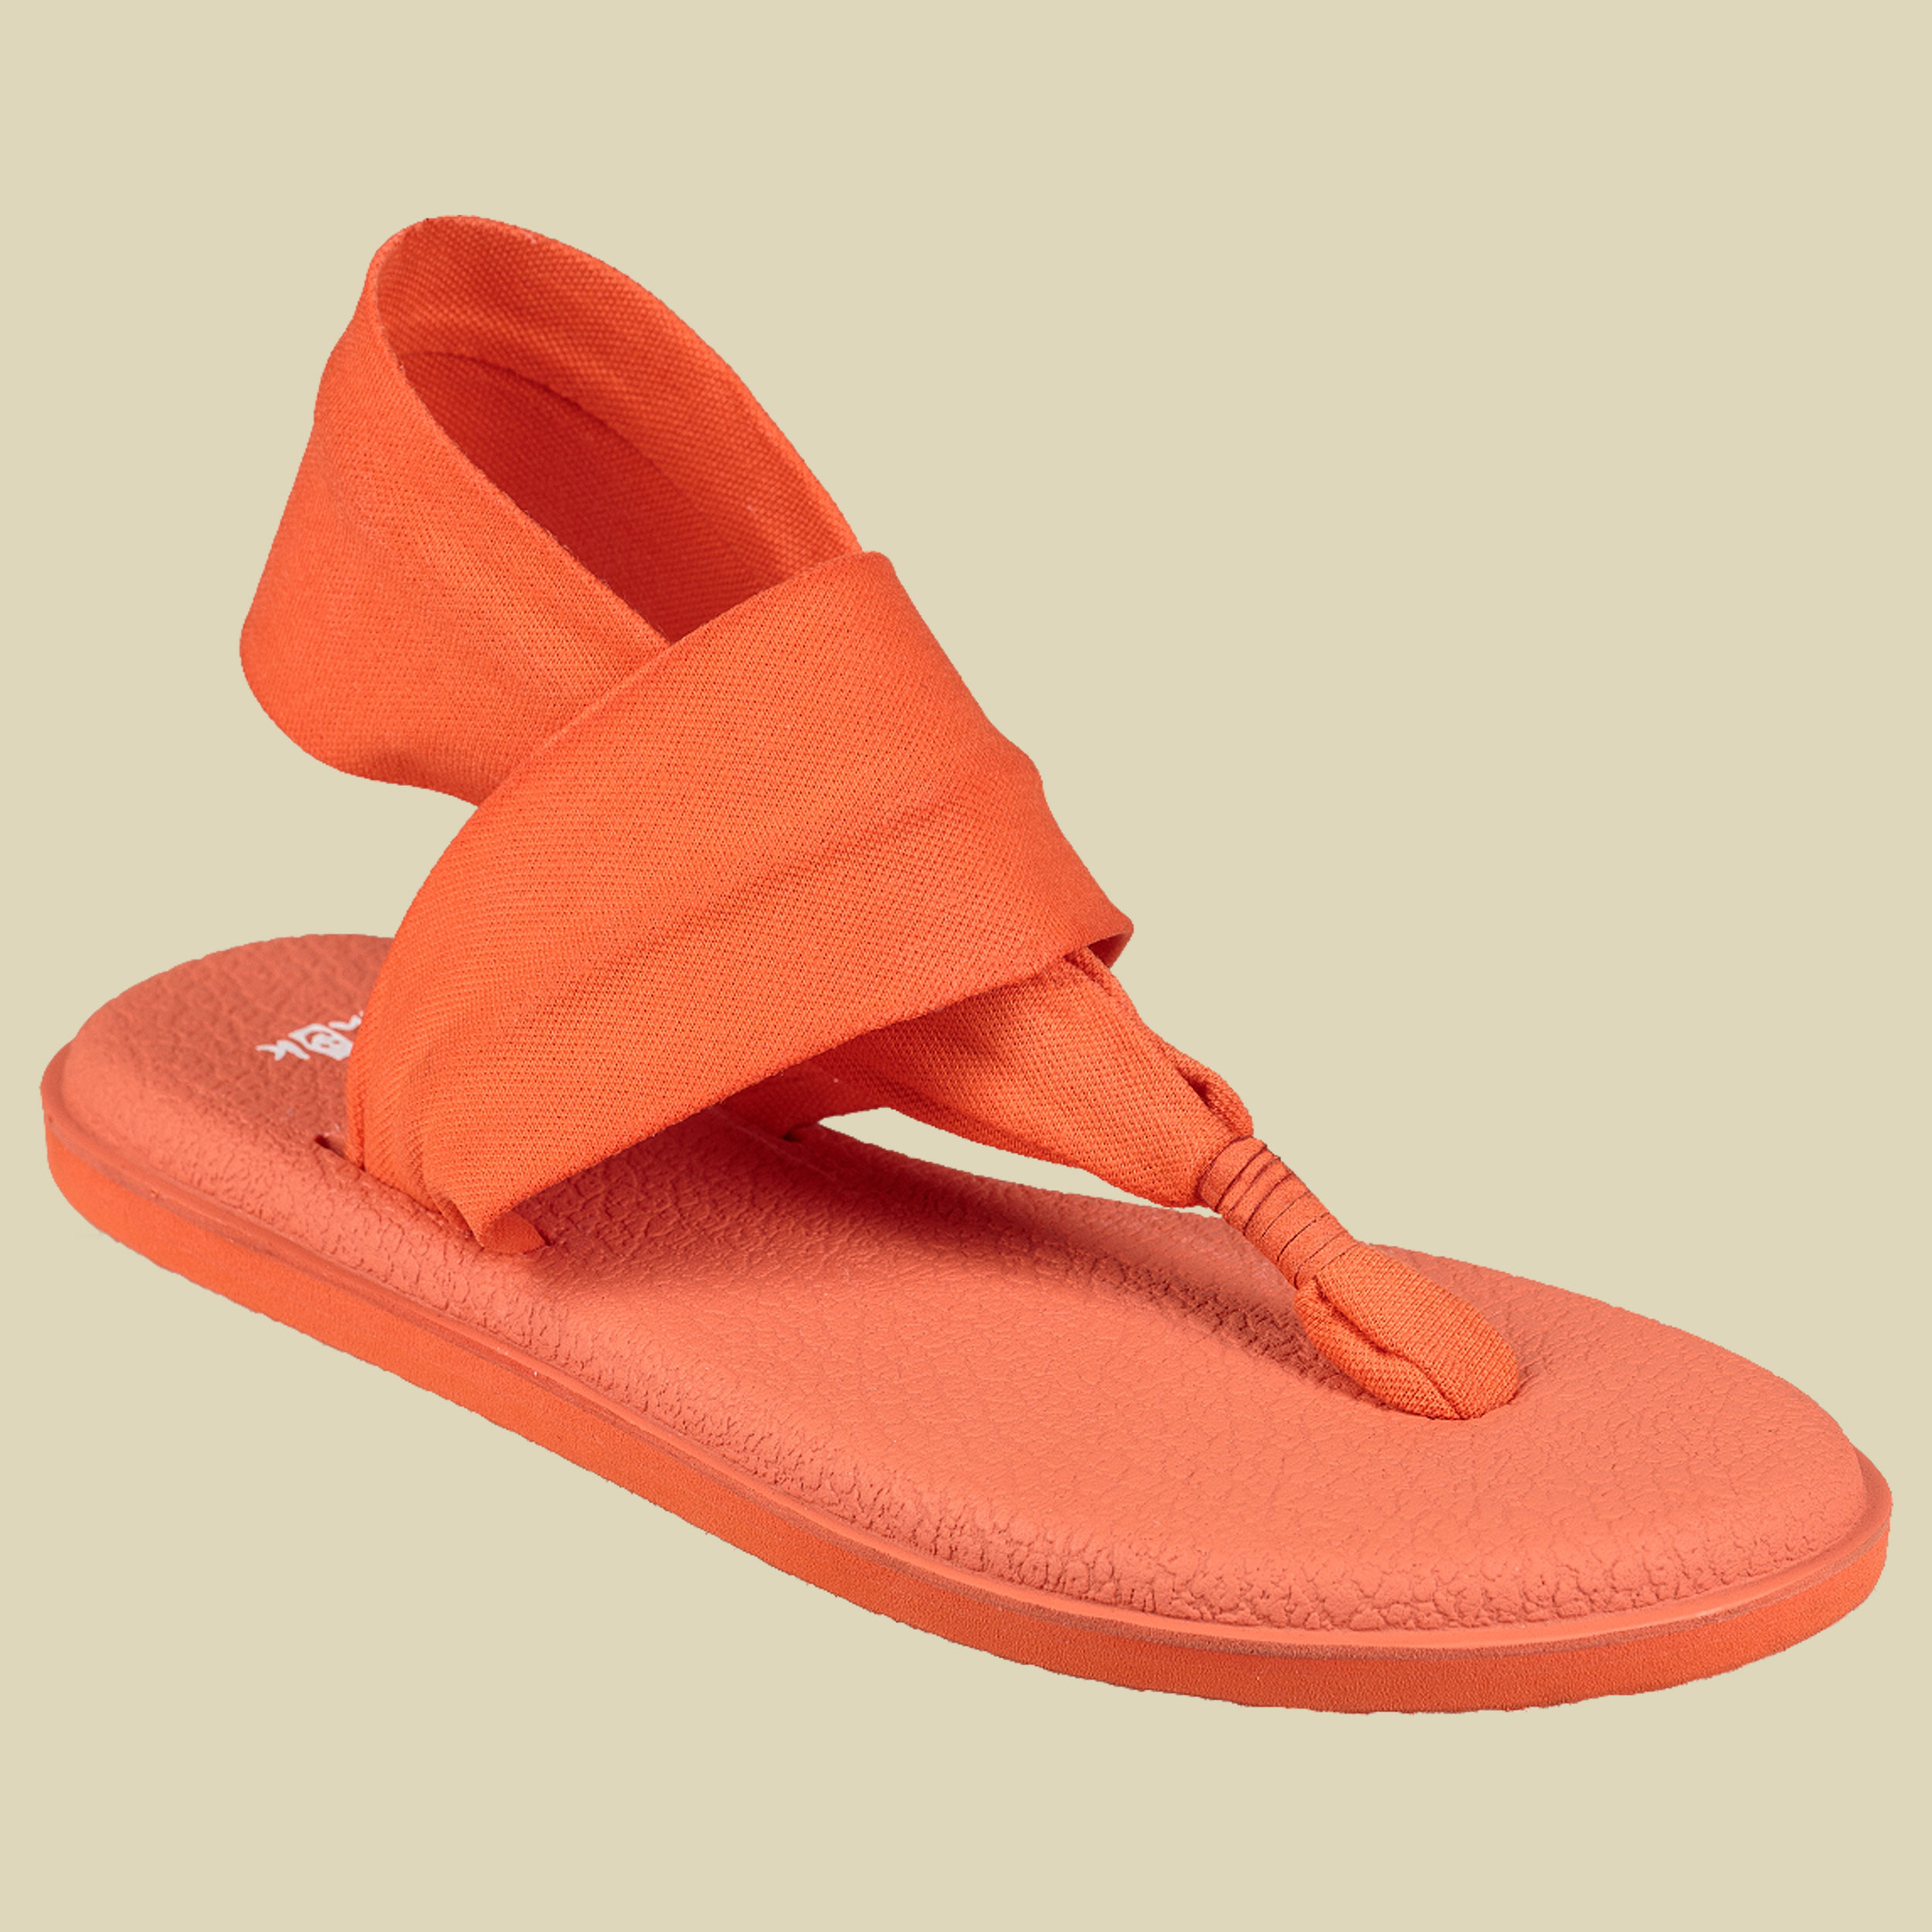 Sanuk Yoga Sling 2 Spectrum Women Damen Zehentrenner-Sandalen Größe UK 5 nasturtium